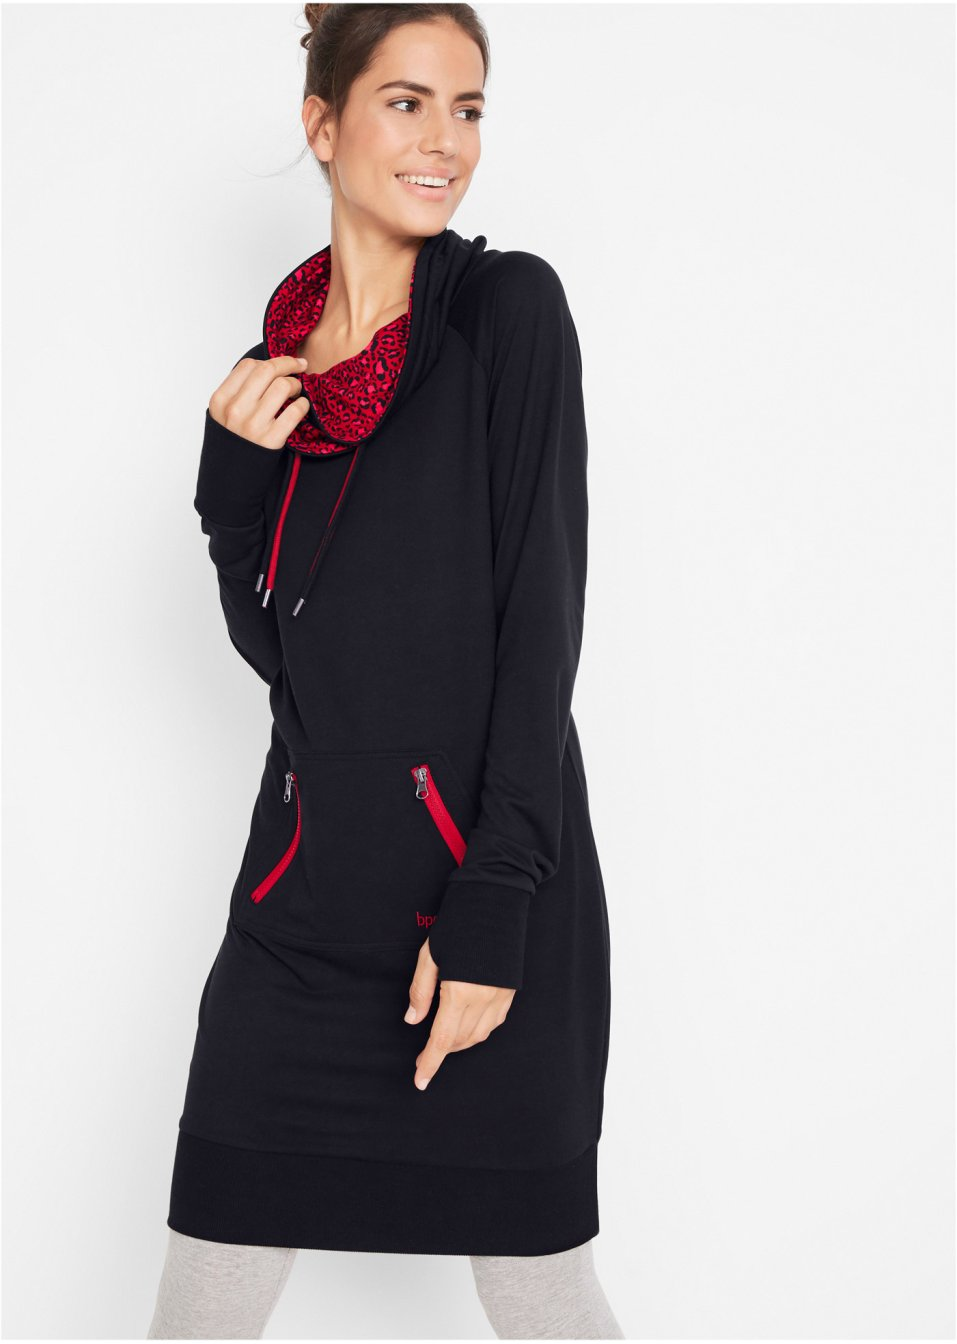 Mode Femme Vêtements DJLfdOFlkj Robe sweat-shirt, manches longues noir Femme .fr